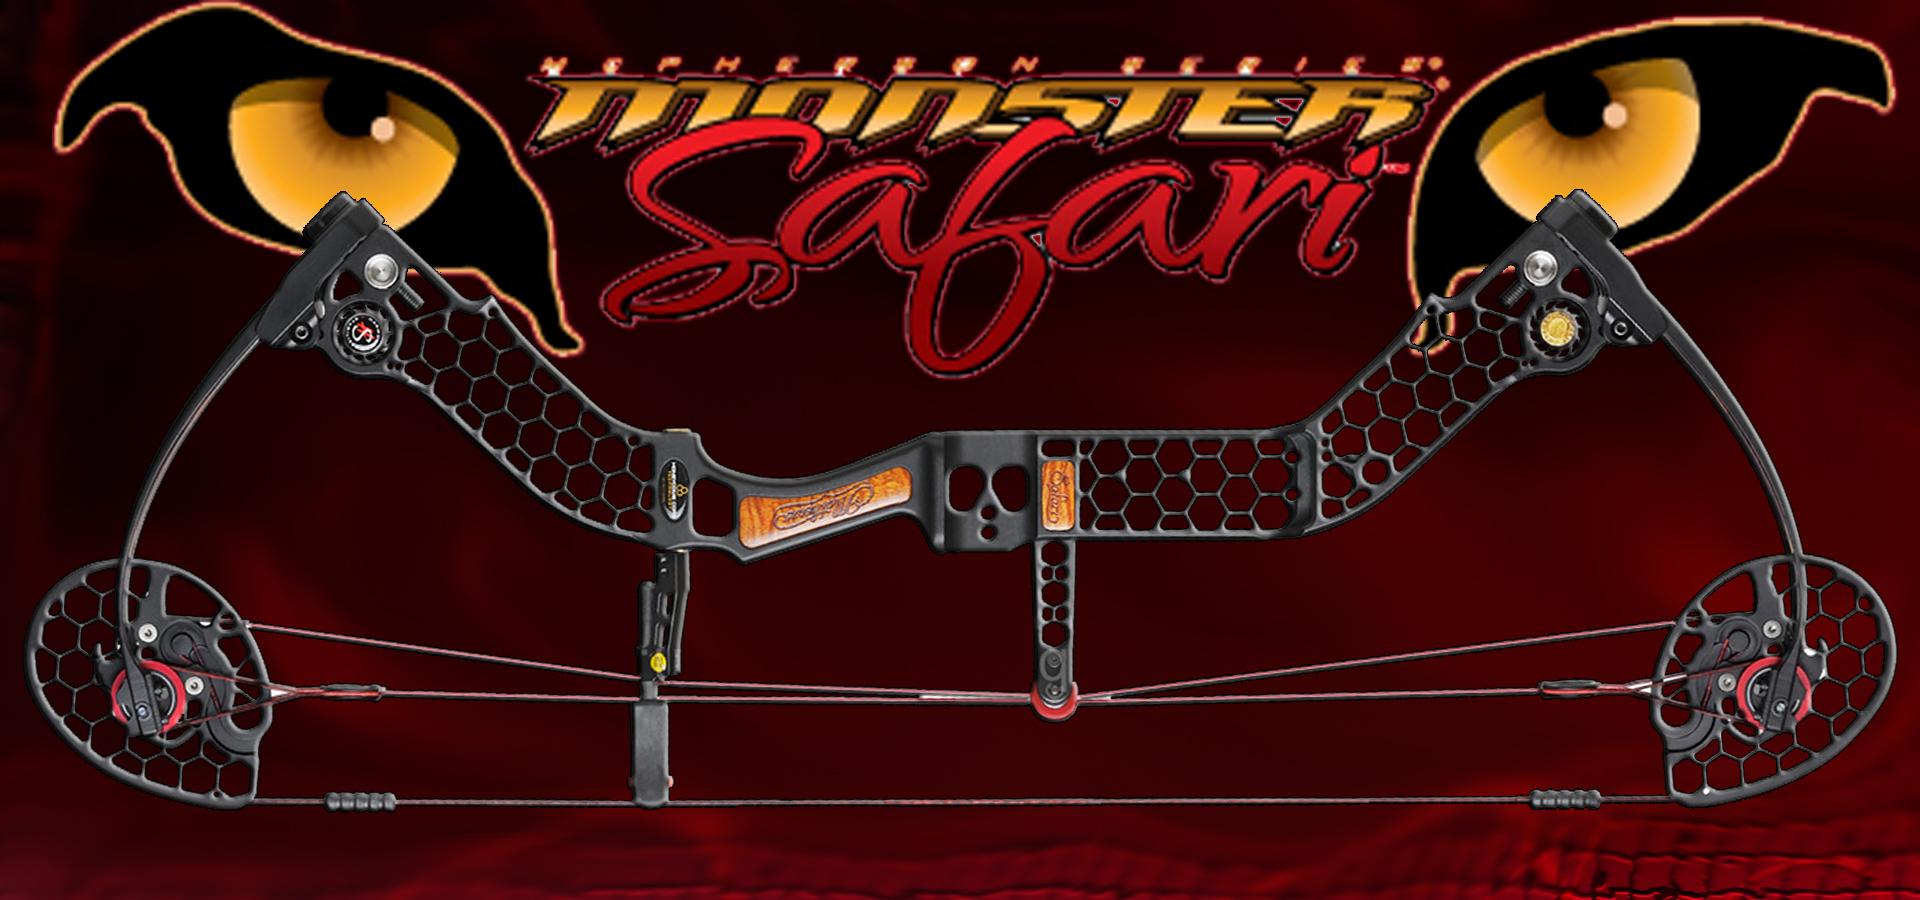 ZAC GRIFFITH MATHEWS MONSTER SAFARI